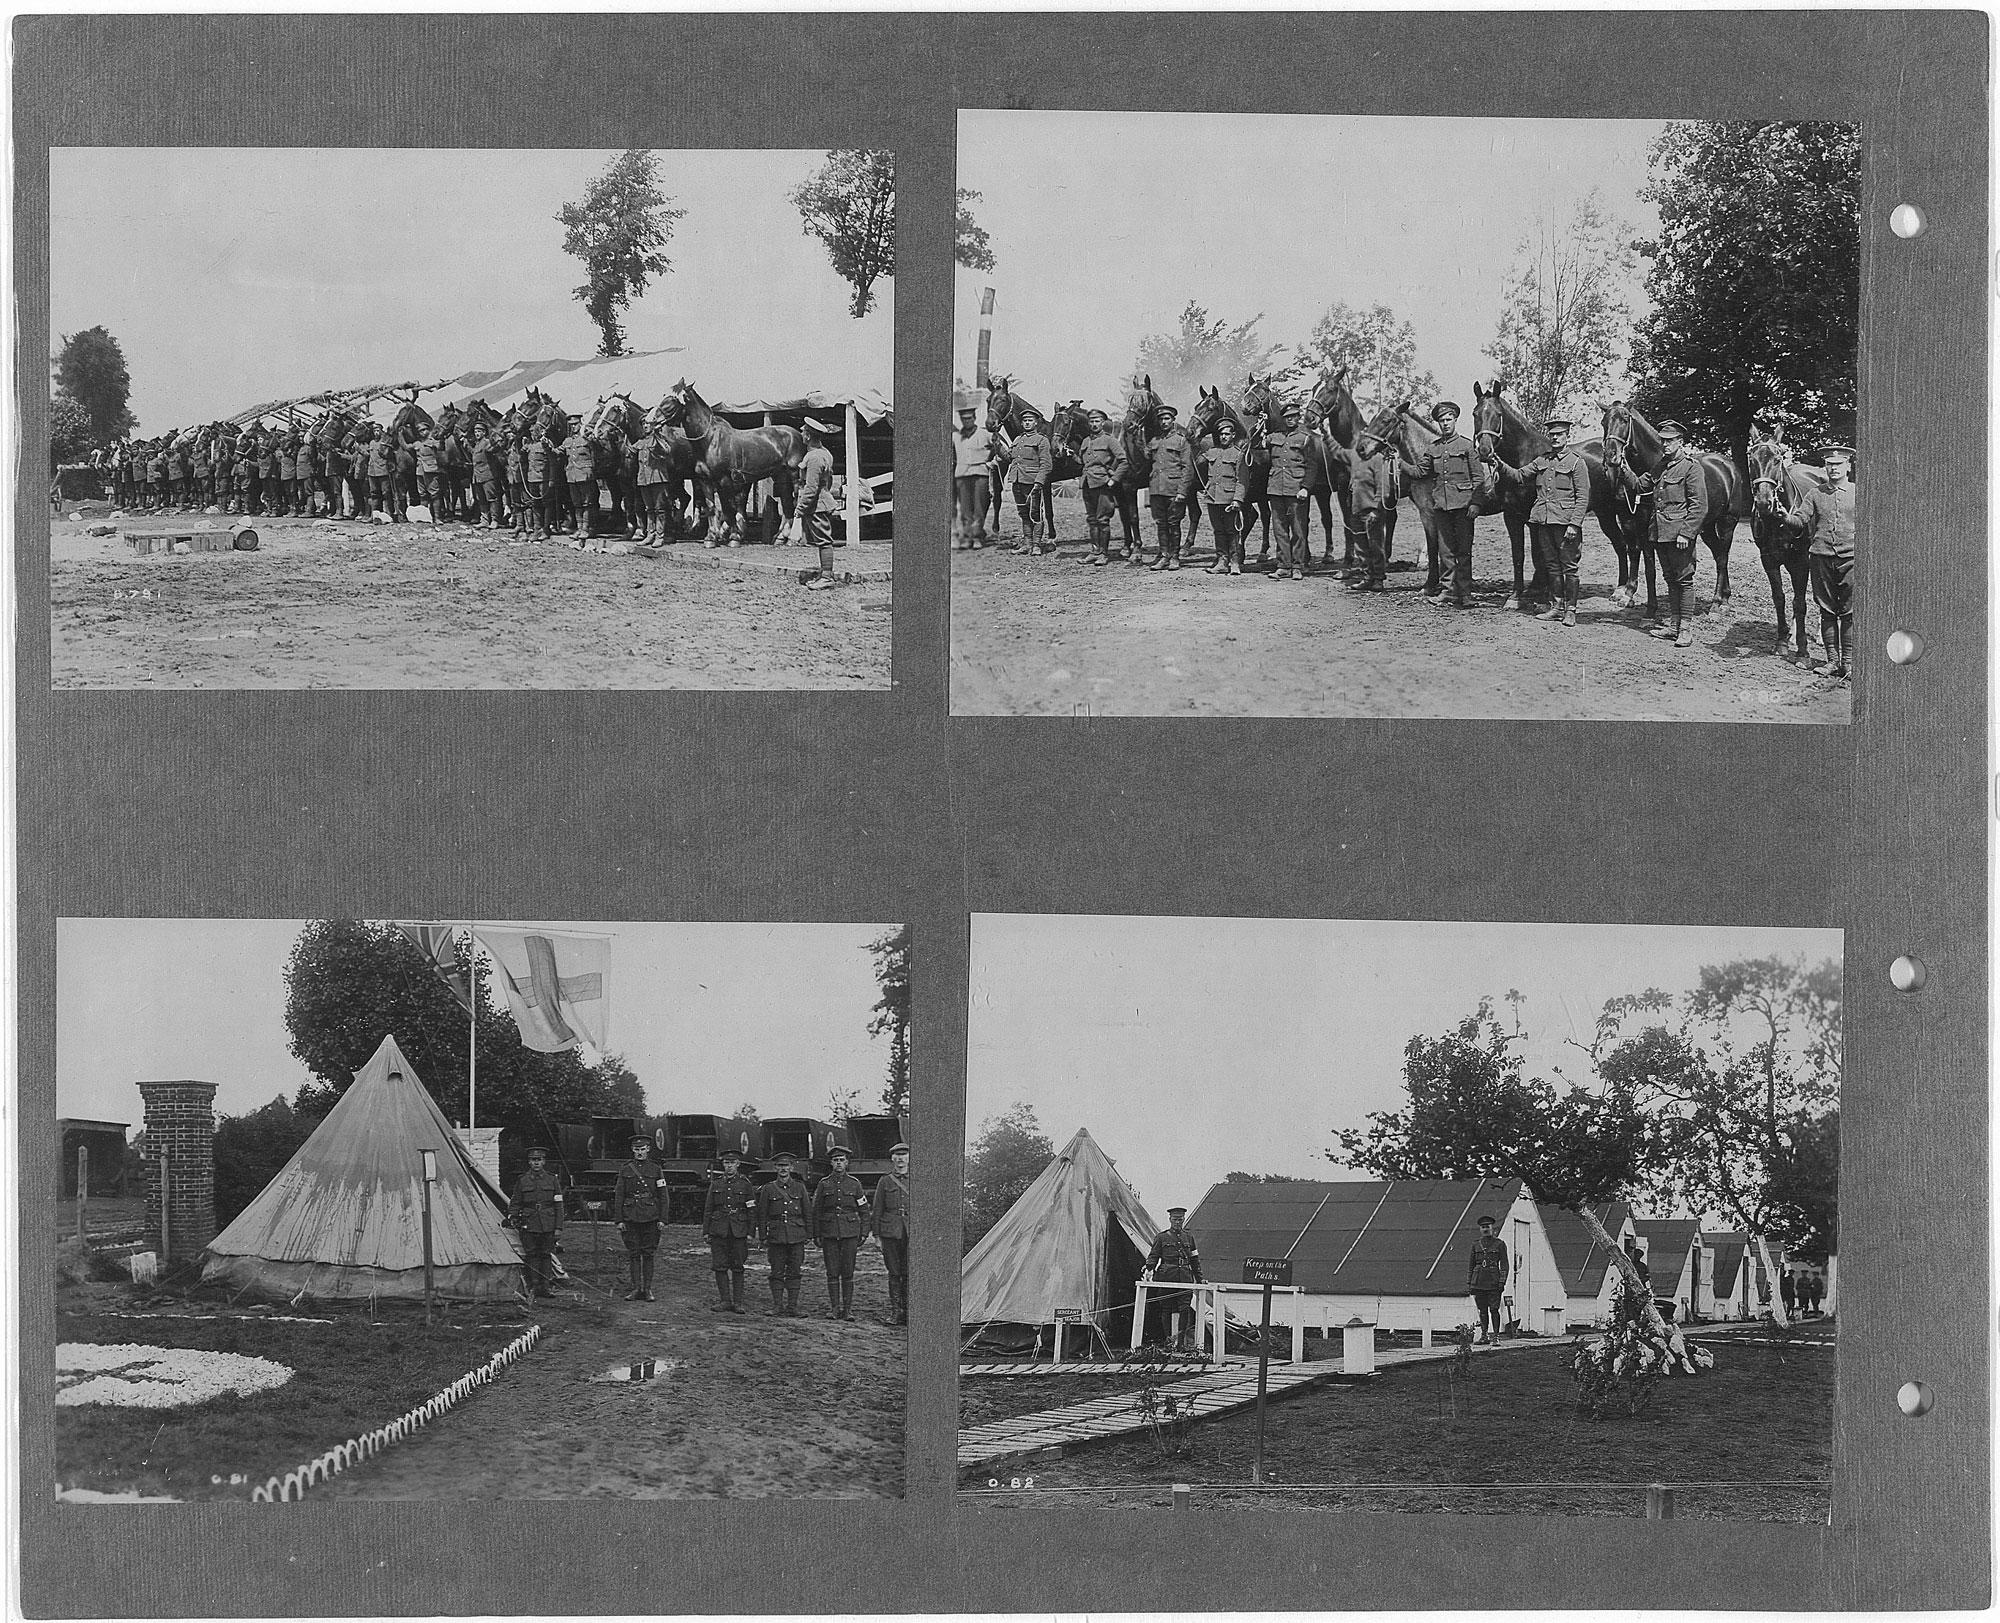 Photographs from the Canadian War Memorials copyright deposit